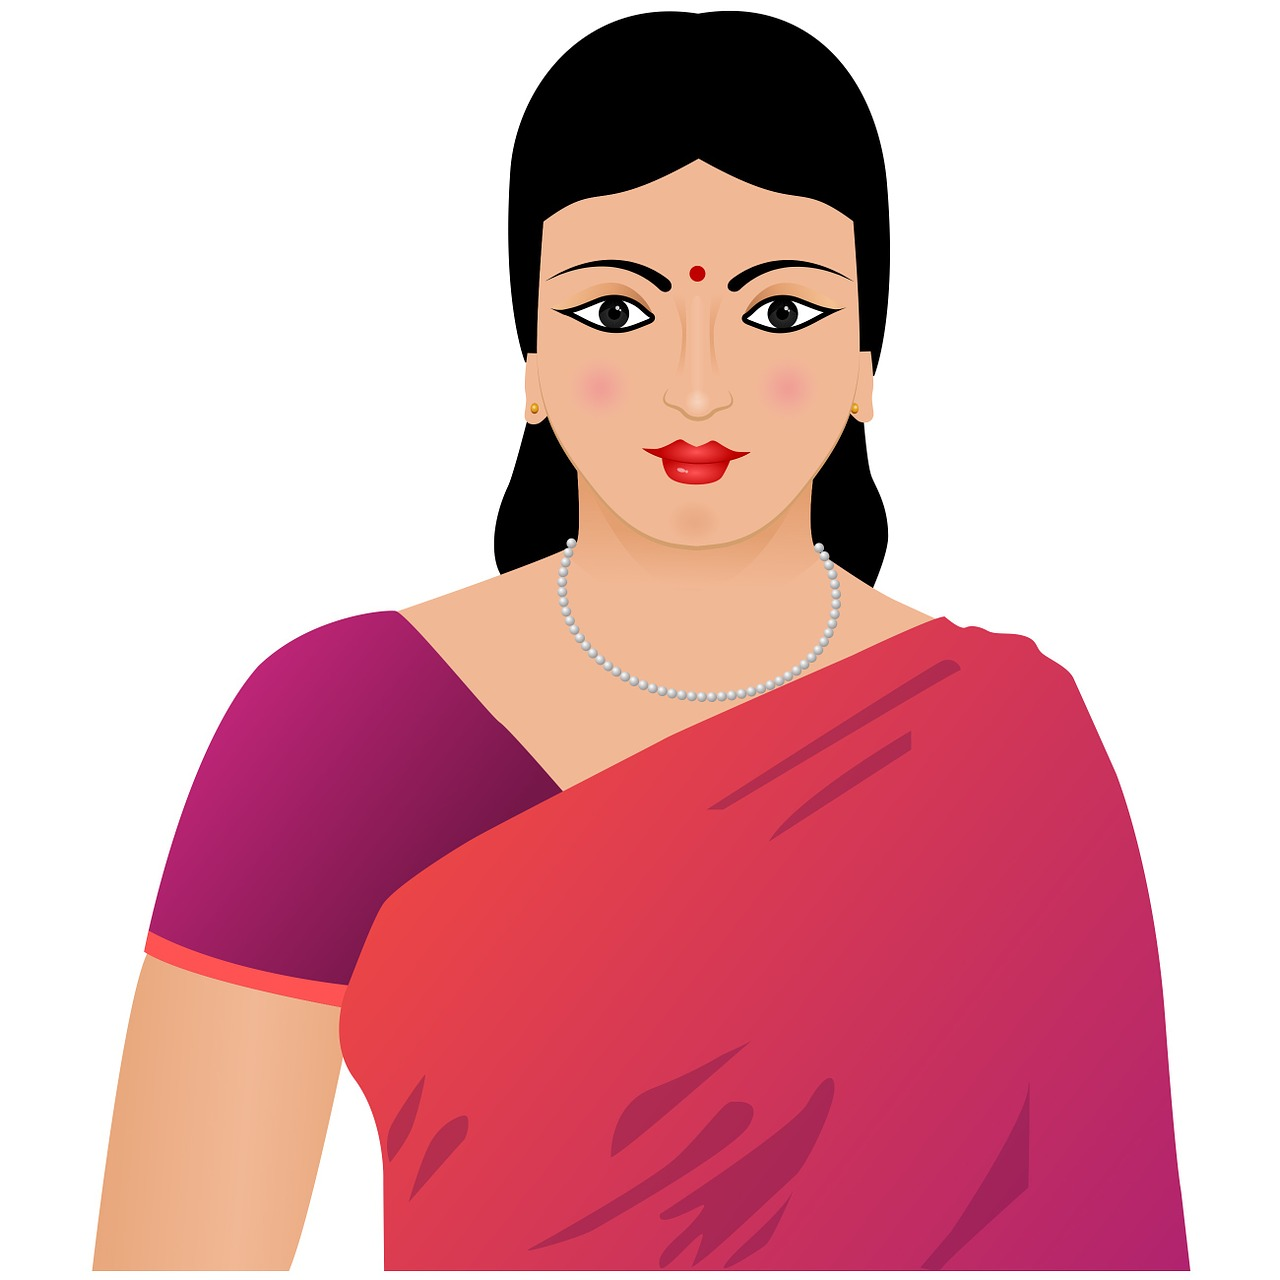 Indian Woman Girl - Free image on Pixabay